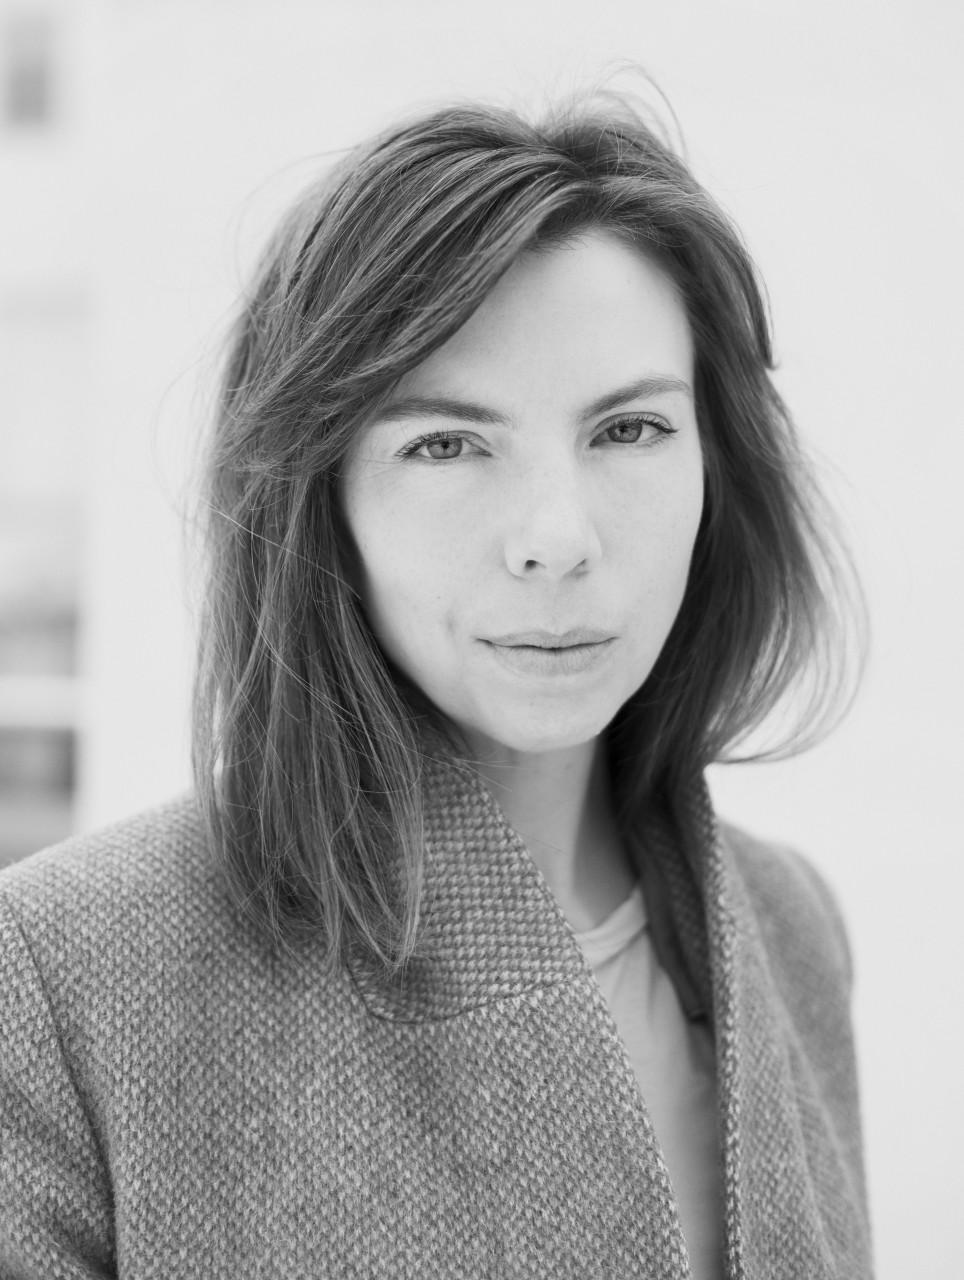 Cecilia Björk